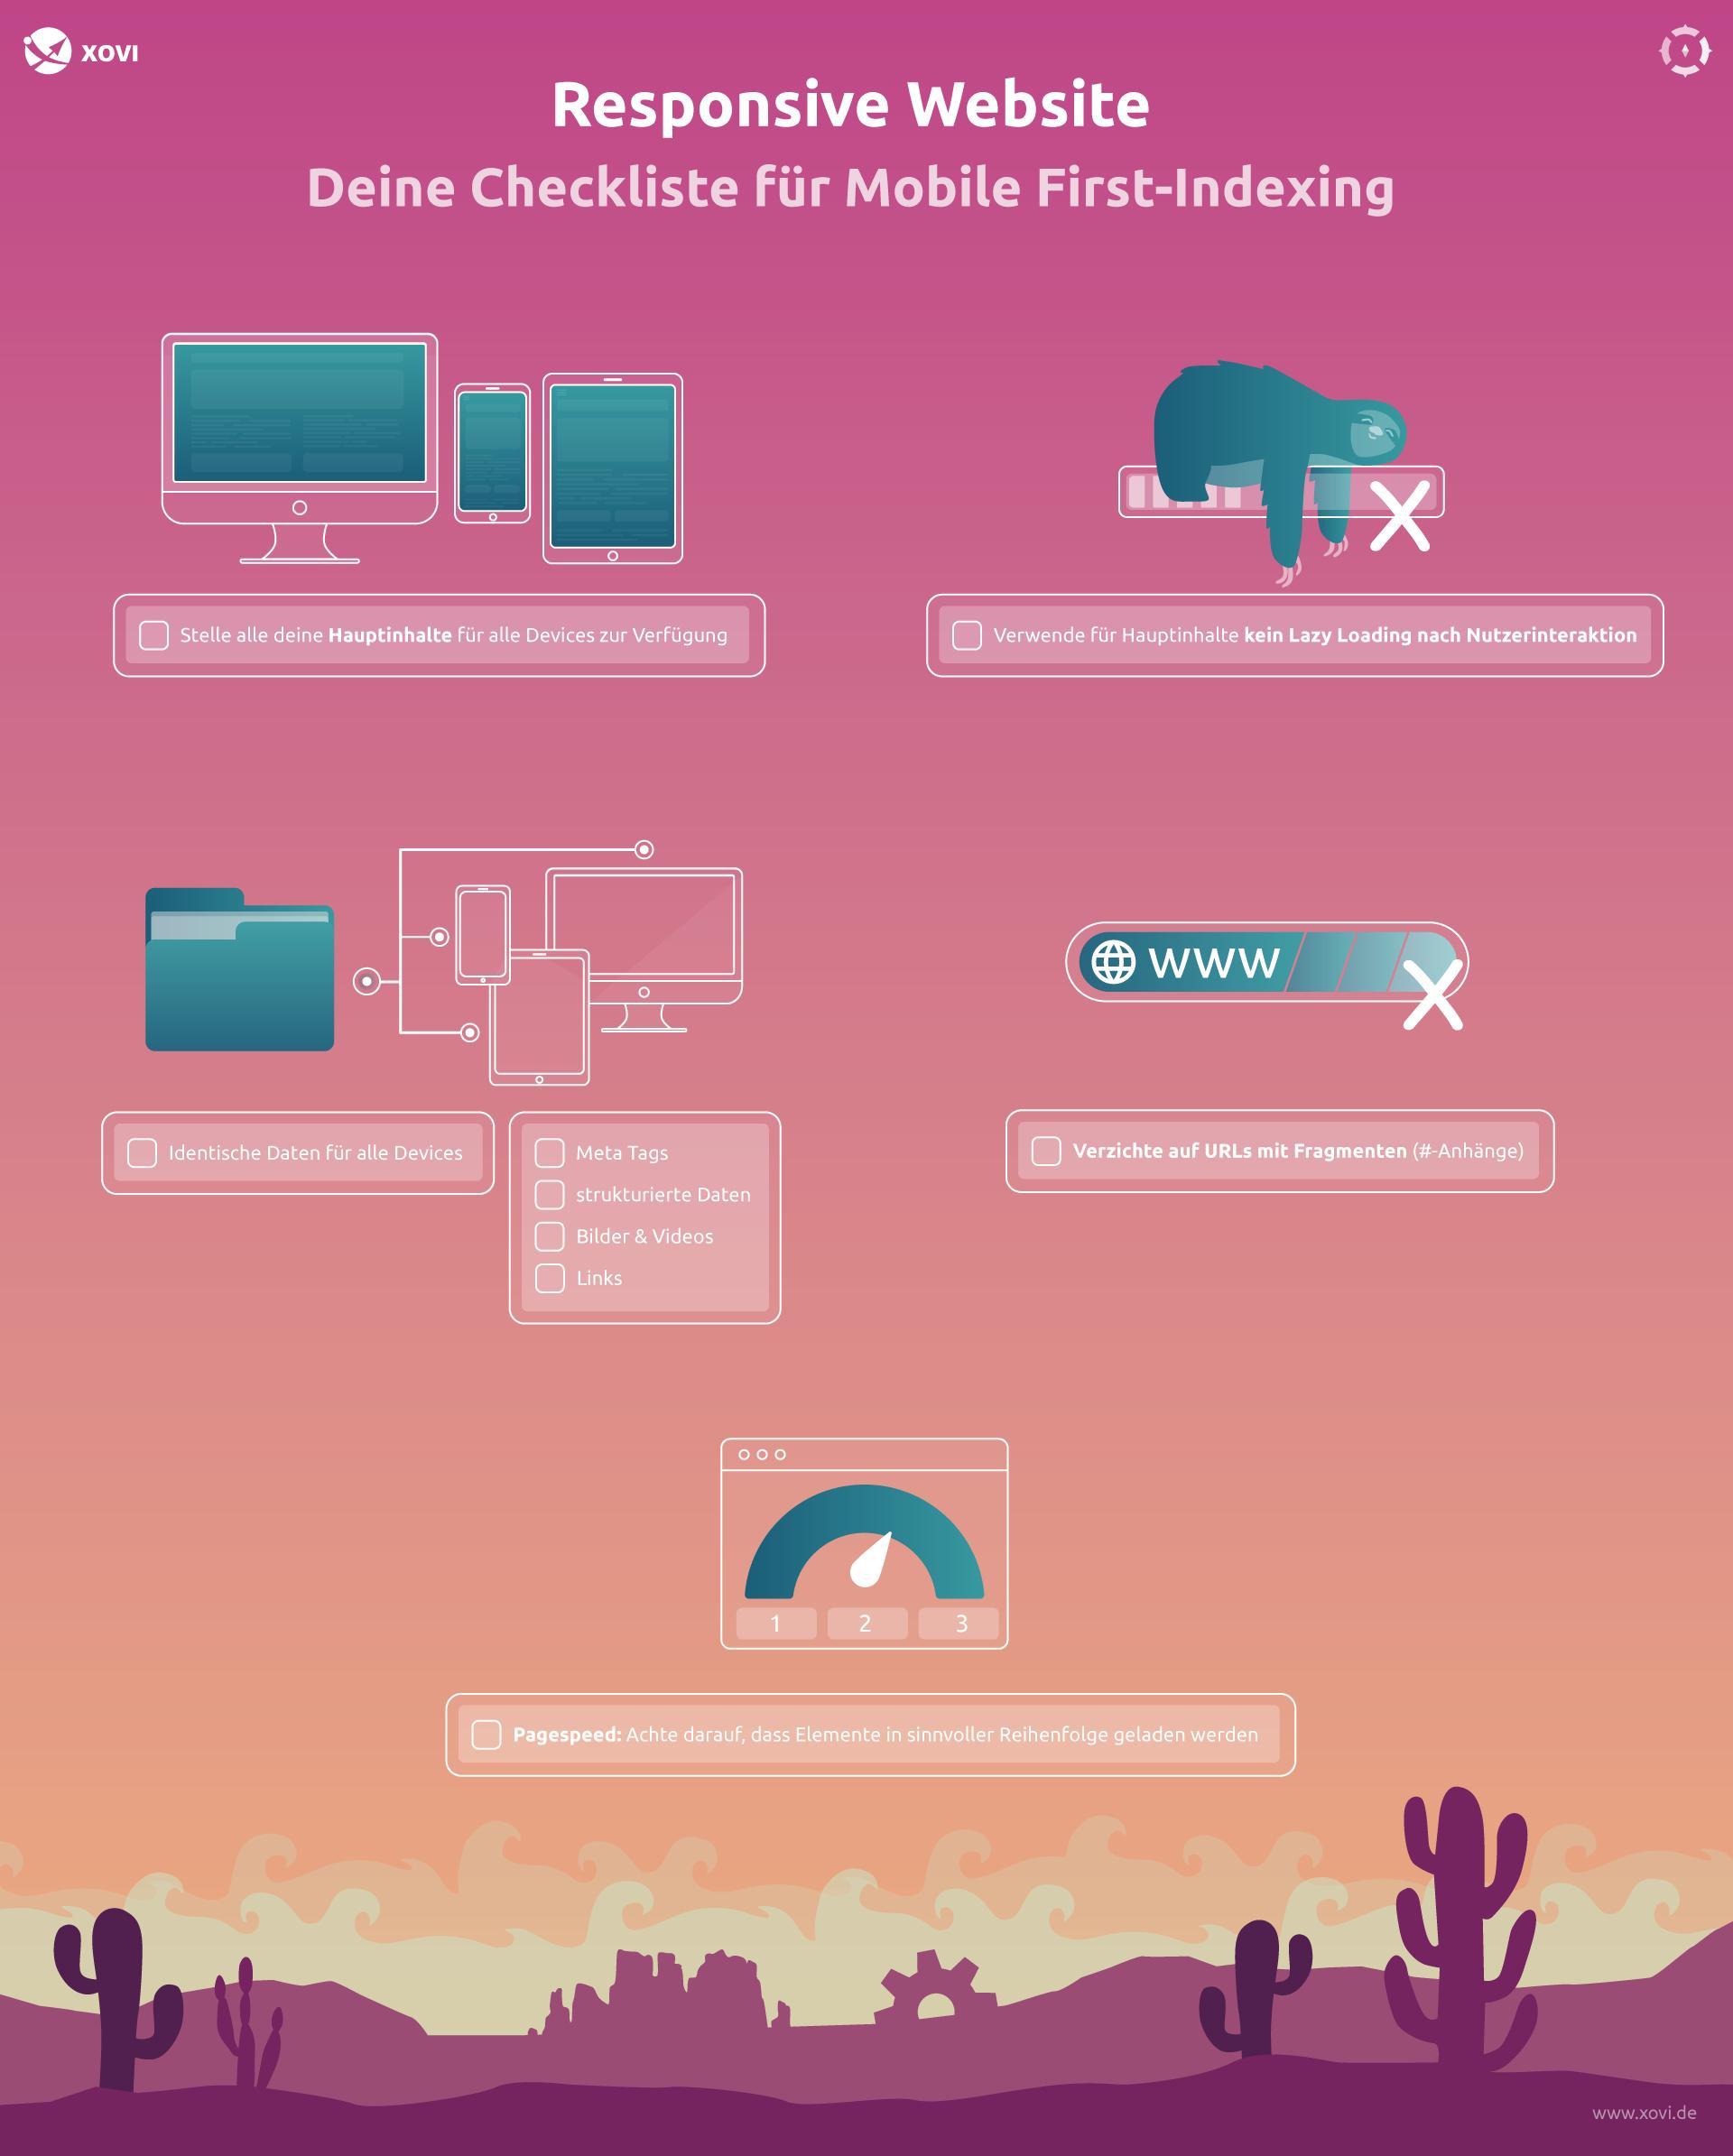 Mobile First Indexing Checkliste für responsive Websites